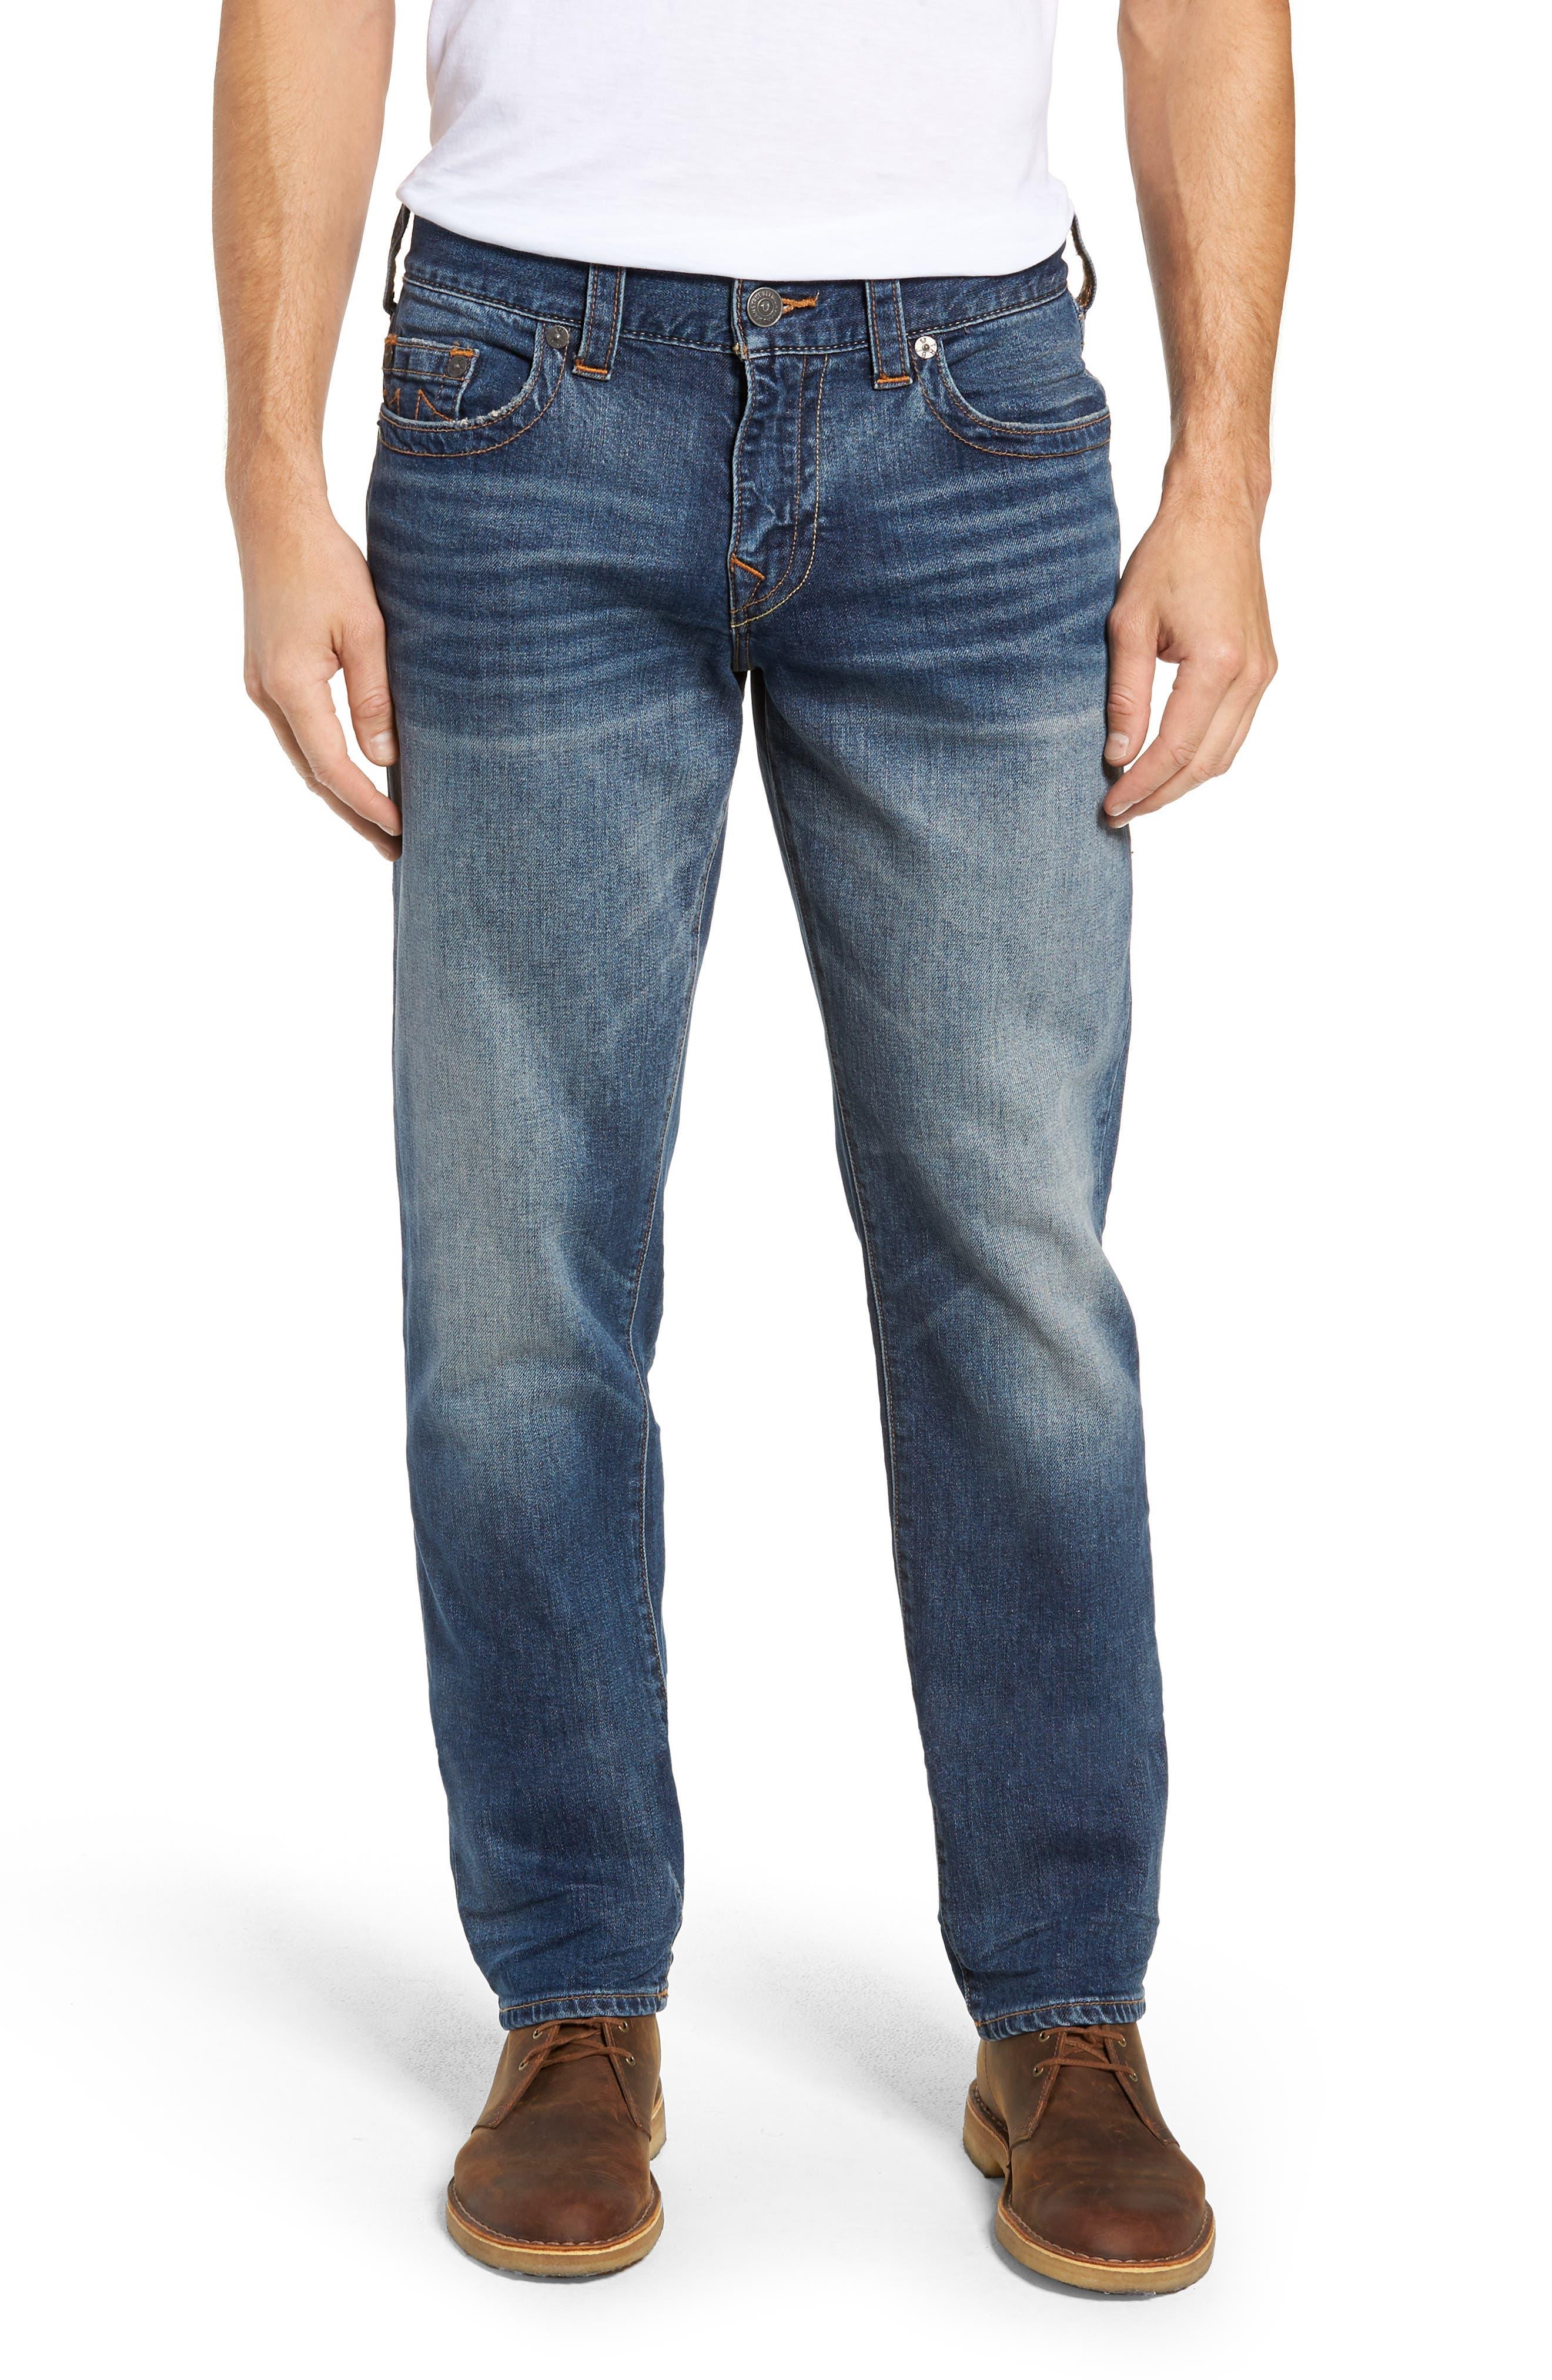 Geno Slim Straight Leg Jeans,                         Main,                         color, JETSET BLUE